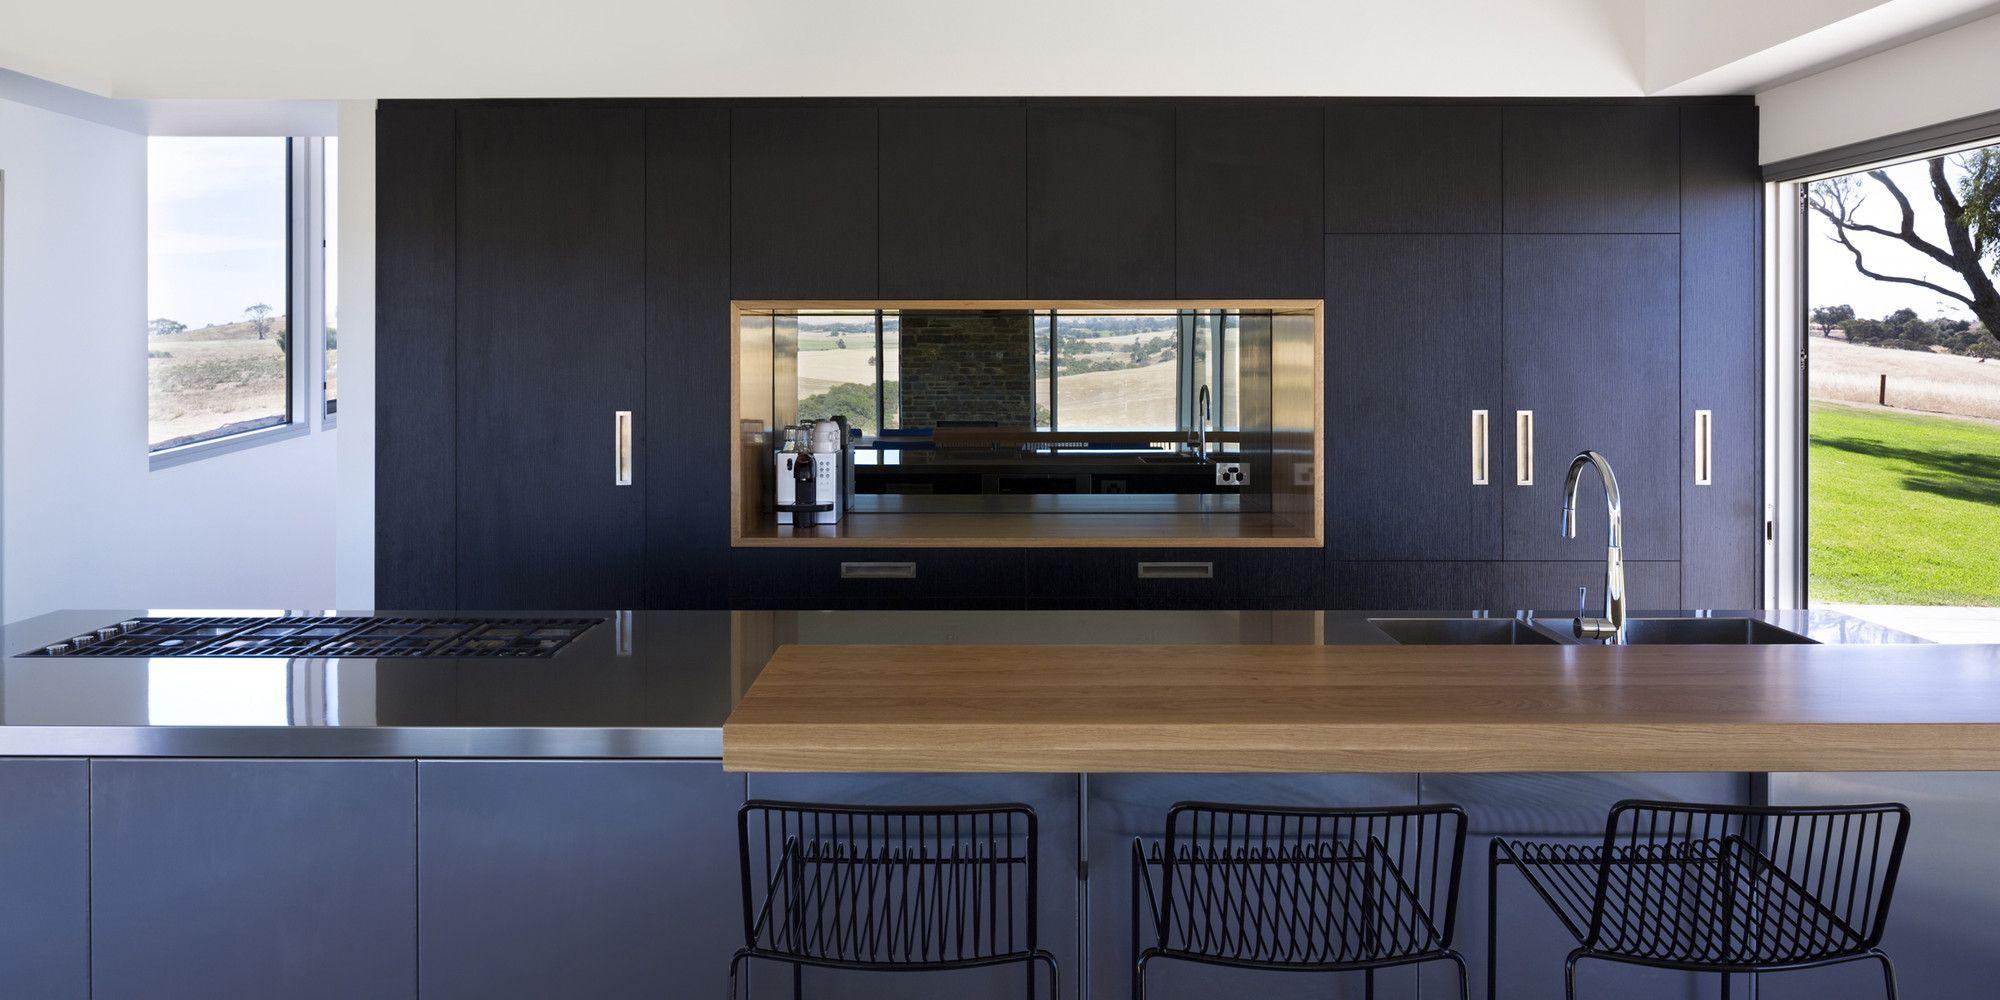 Kitchen Designer Salary Awesome Pinlisa Booth On Kitchen & Bathroom  Pinterest  Kitchens Design Decoration